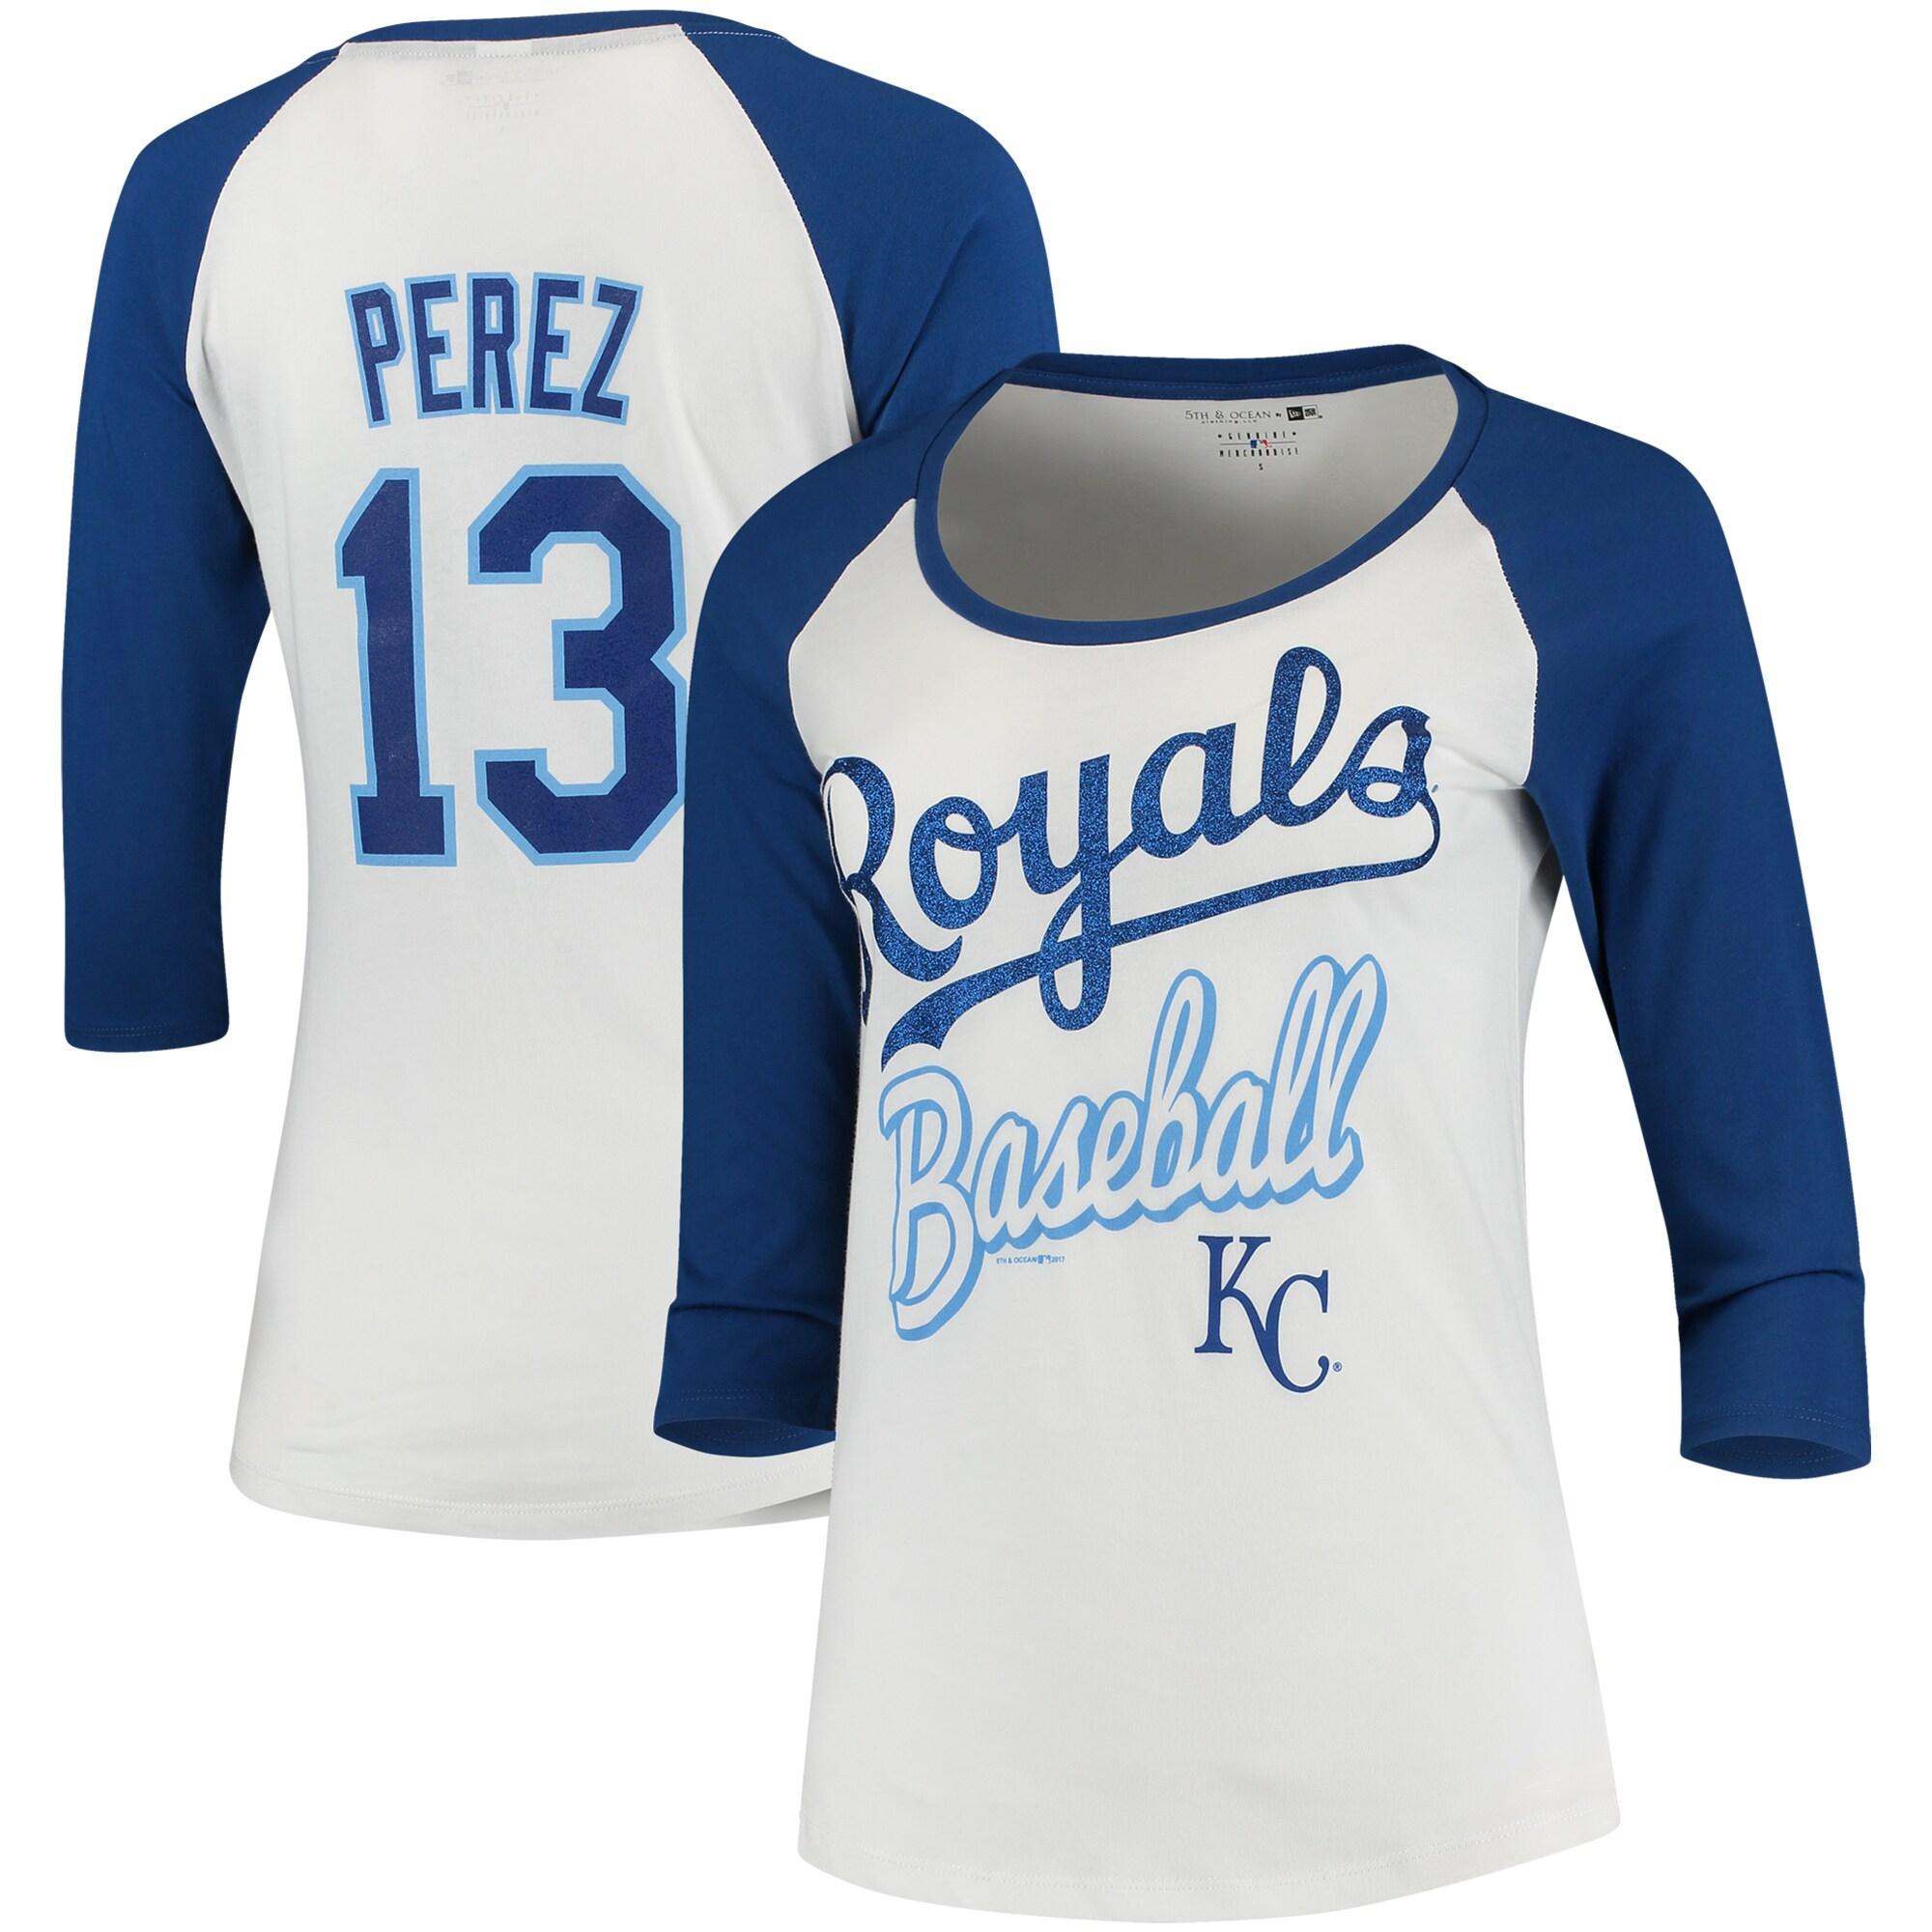 Salvador Perez Kansas City Royals 5th & Ocean by New Era Women's Glitter 3/4-Sleeve Raglan T-Shirt - White/Royal